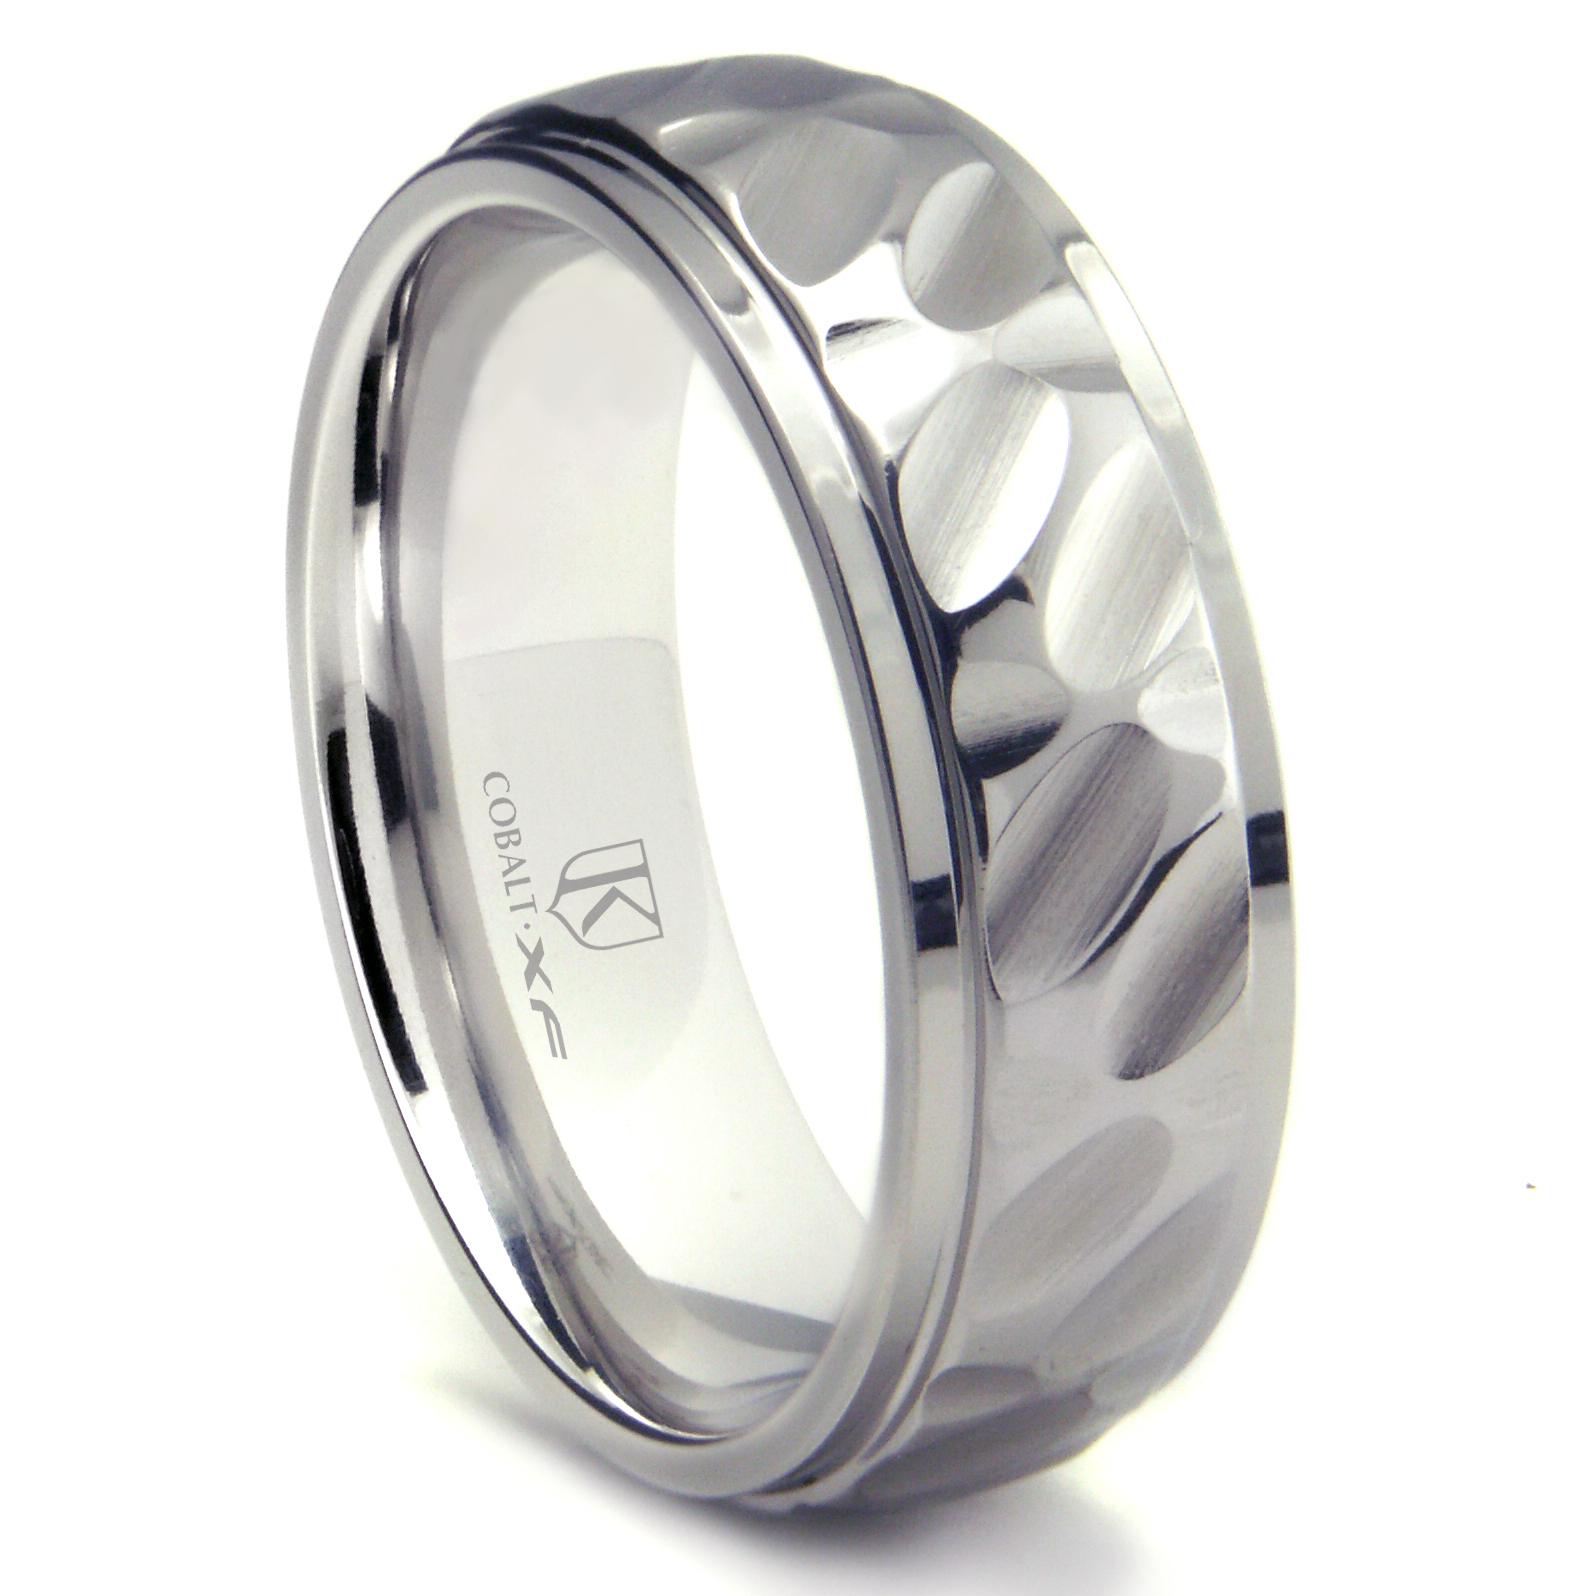 cobalt xf chrome 8mm hammer finish wedding band ring